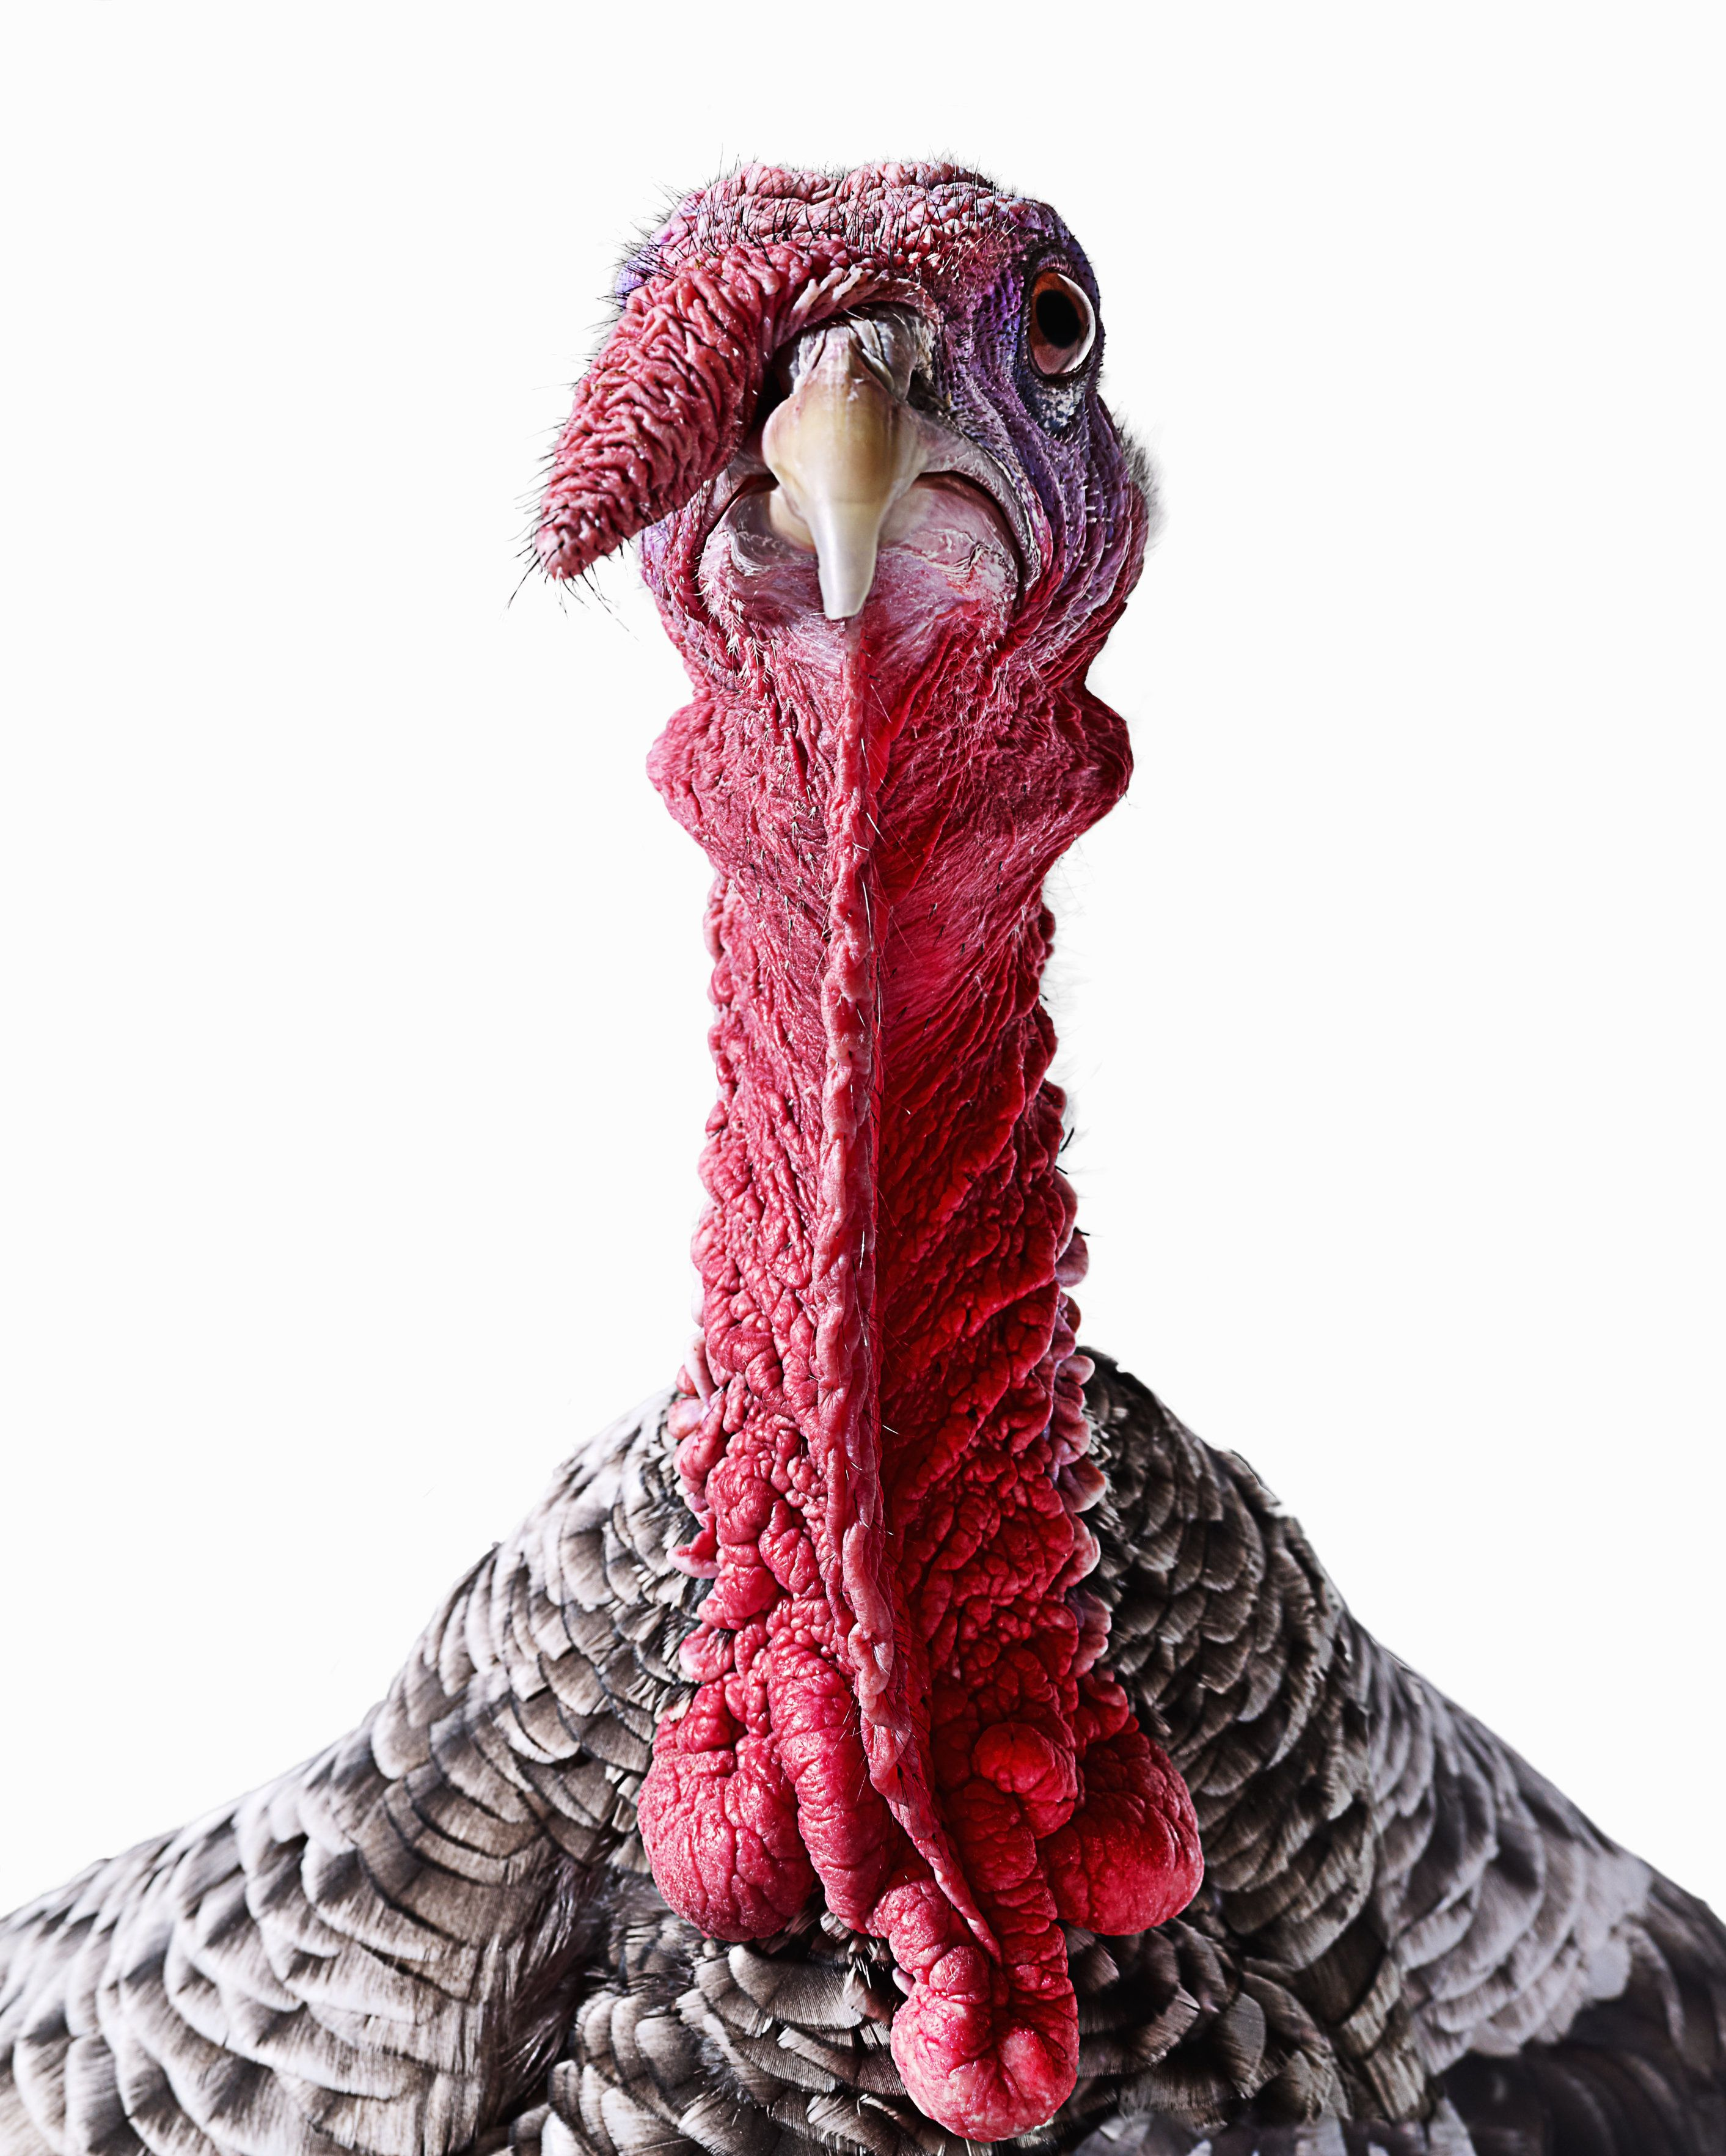 Portrait of Turkey